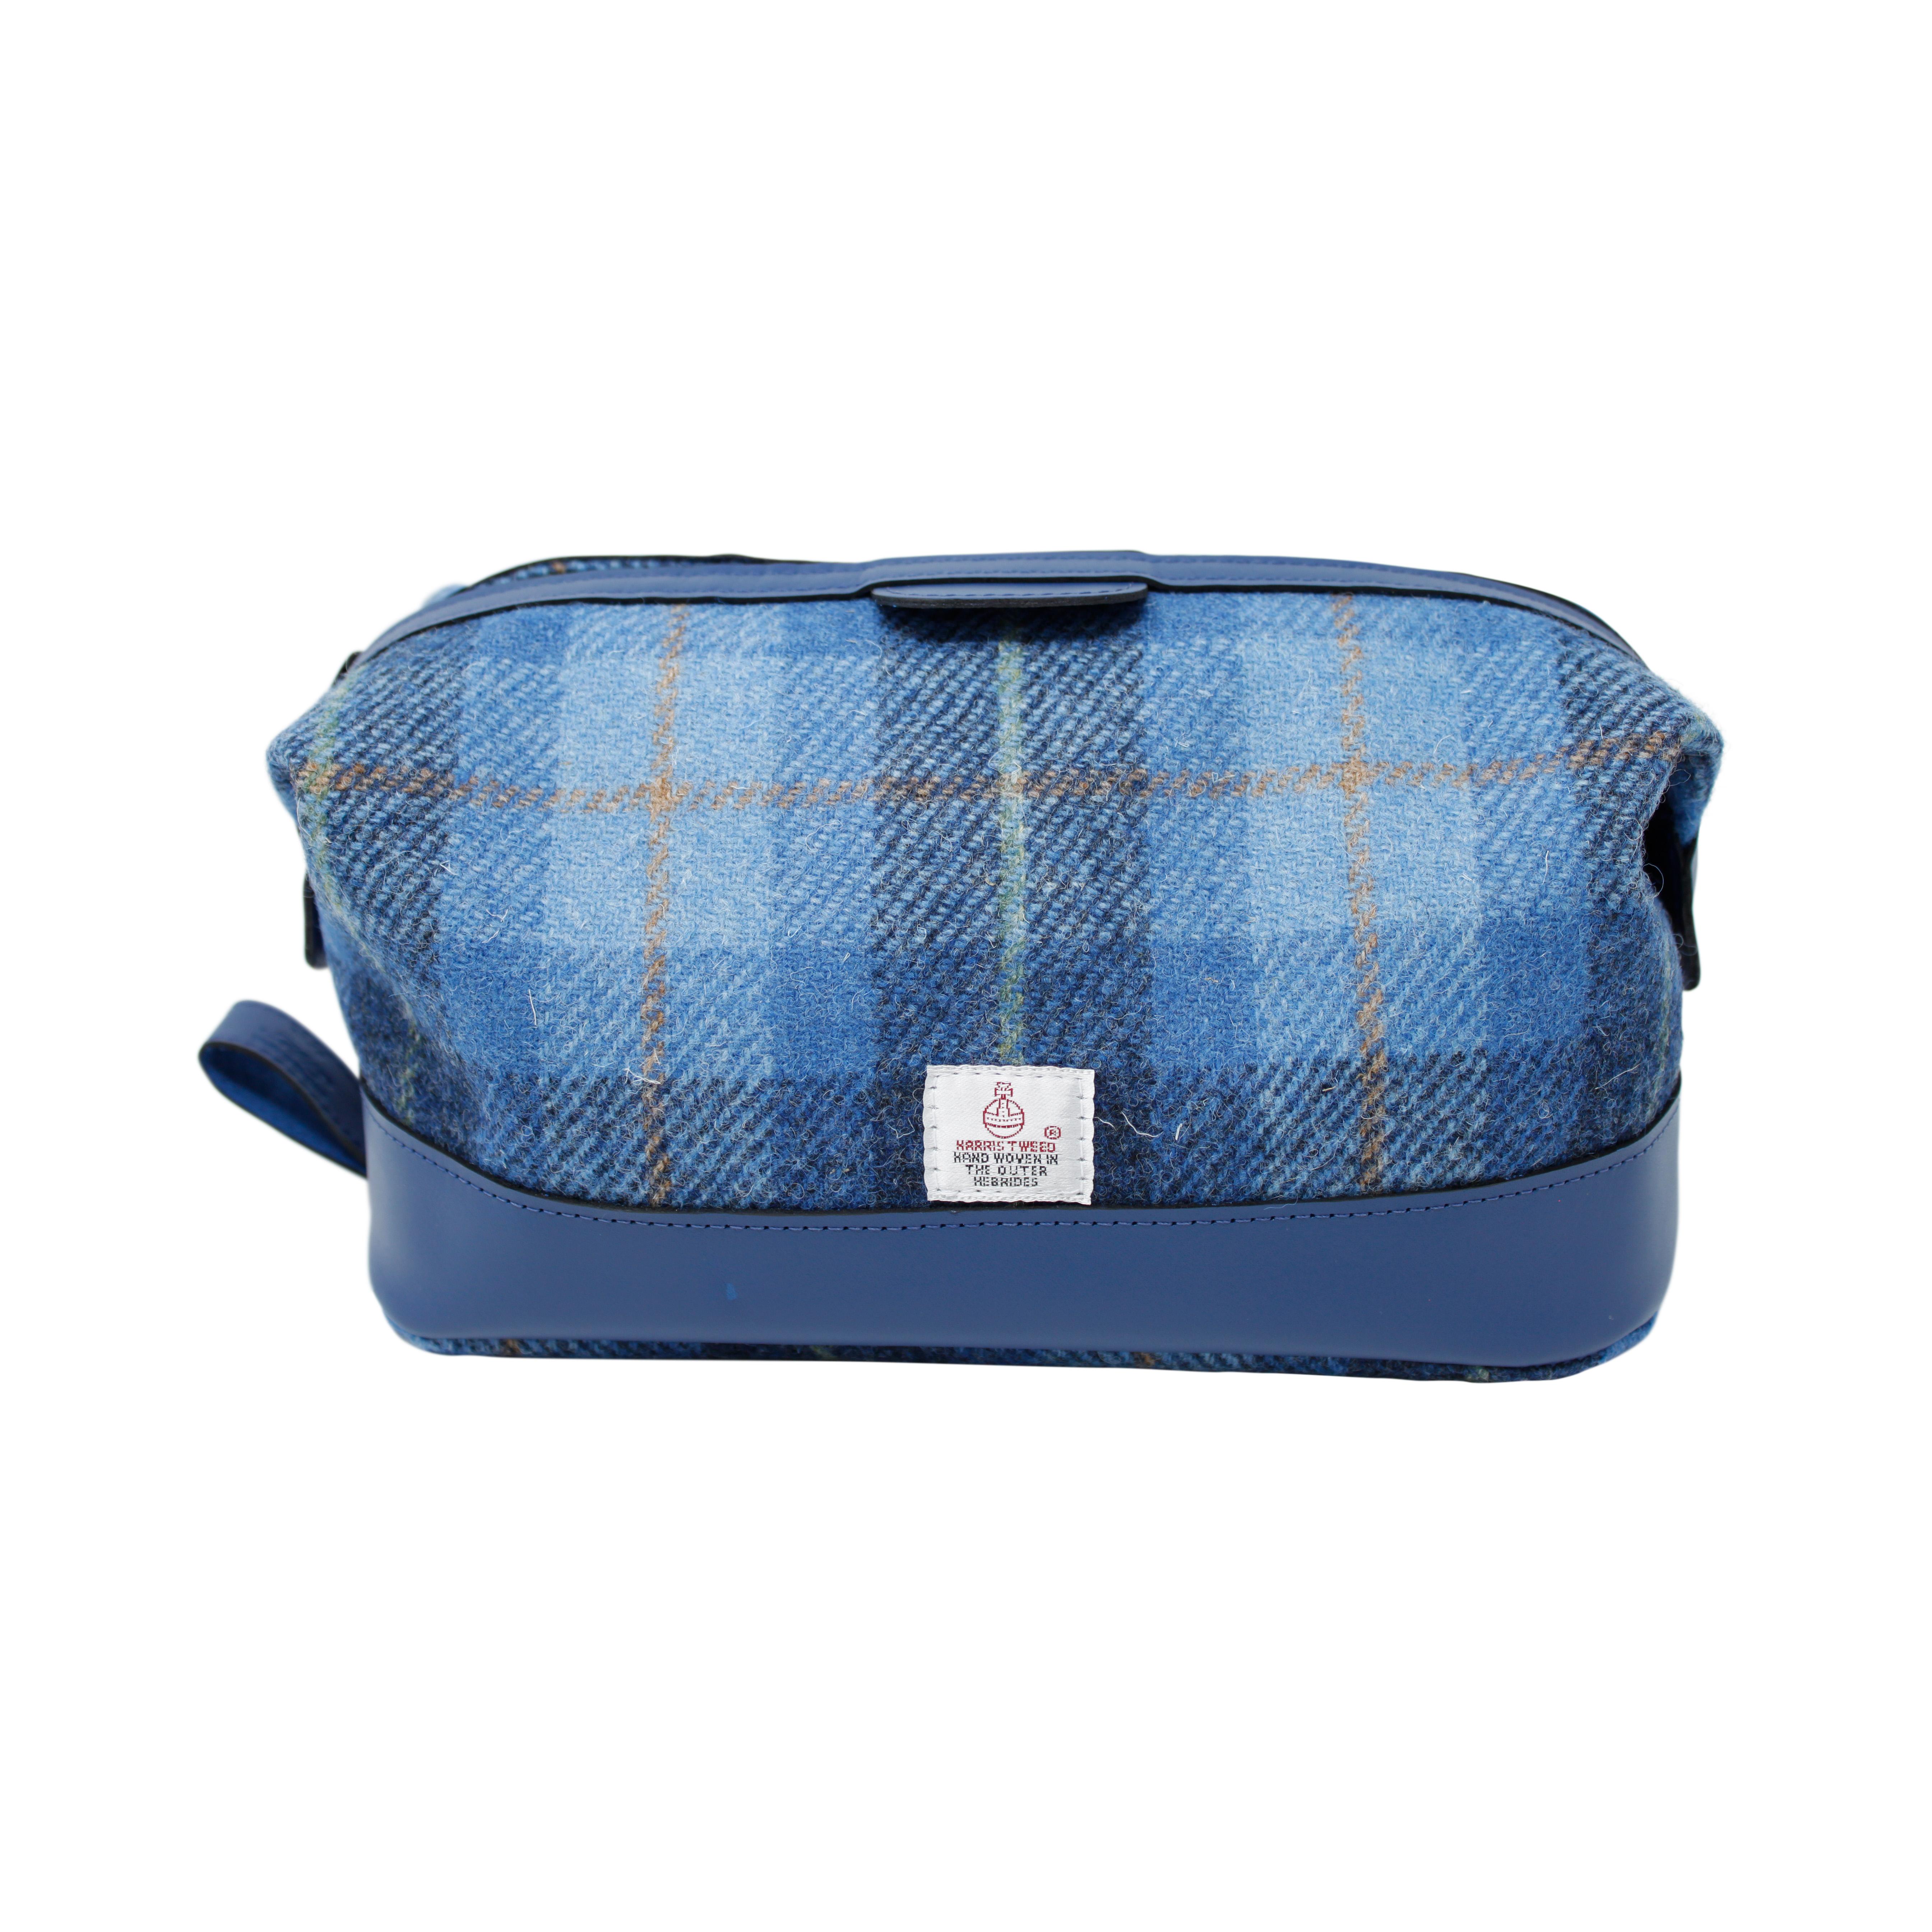 1bafc78121bc Harris Tweed and Blue Leather Wash Bag